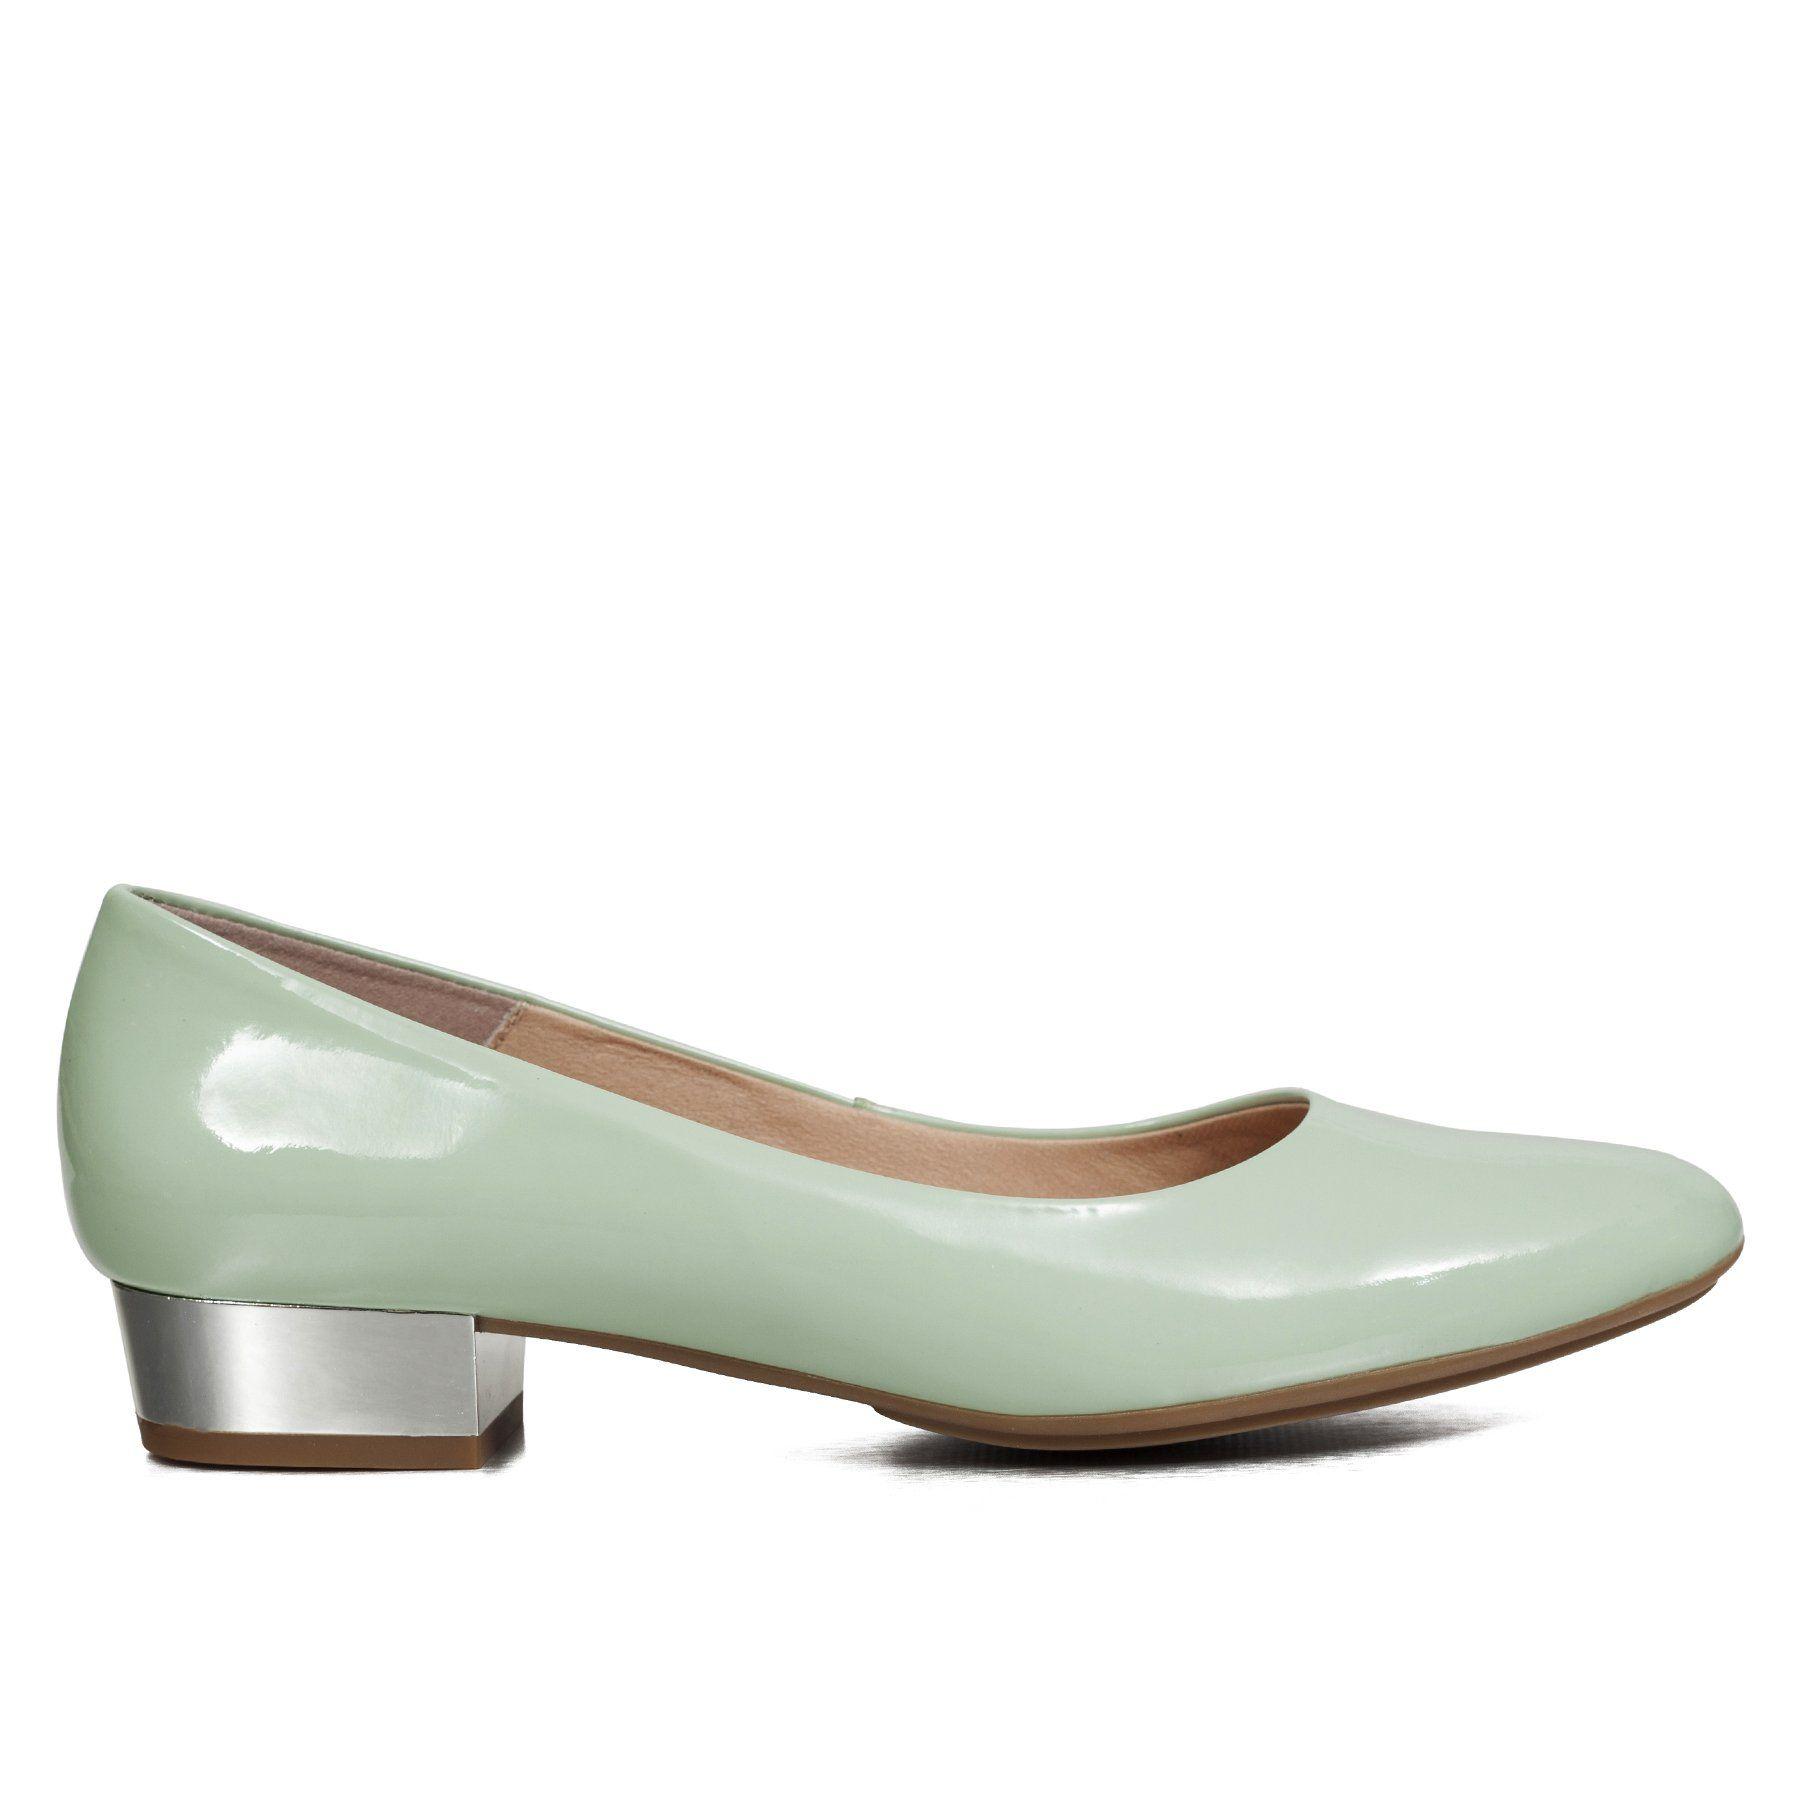 988bf5e8 Zapato tacón bajo charol mujer VERDES AGUA – miMaO Spain Tienda Online – miMaO  ShopOnline